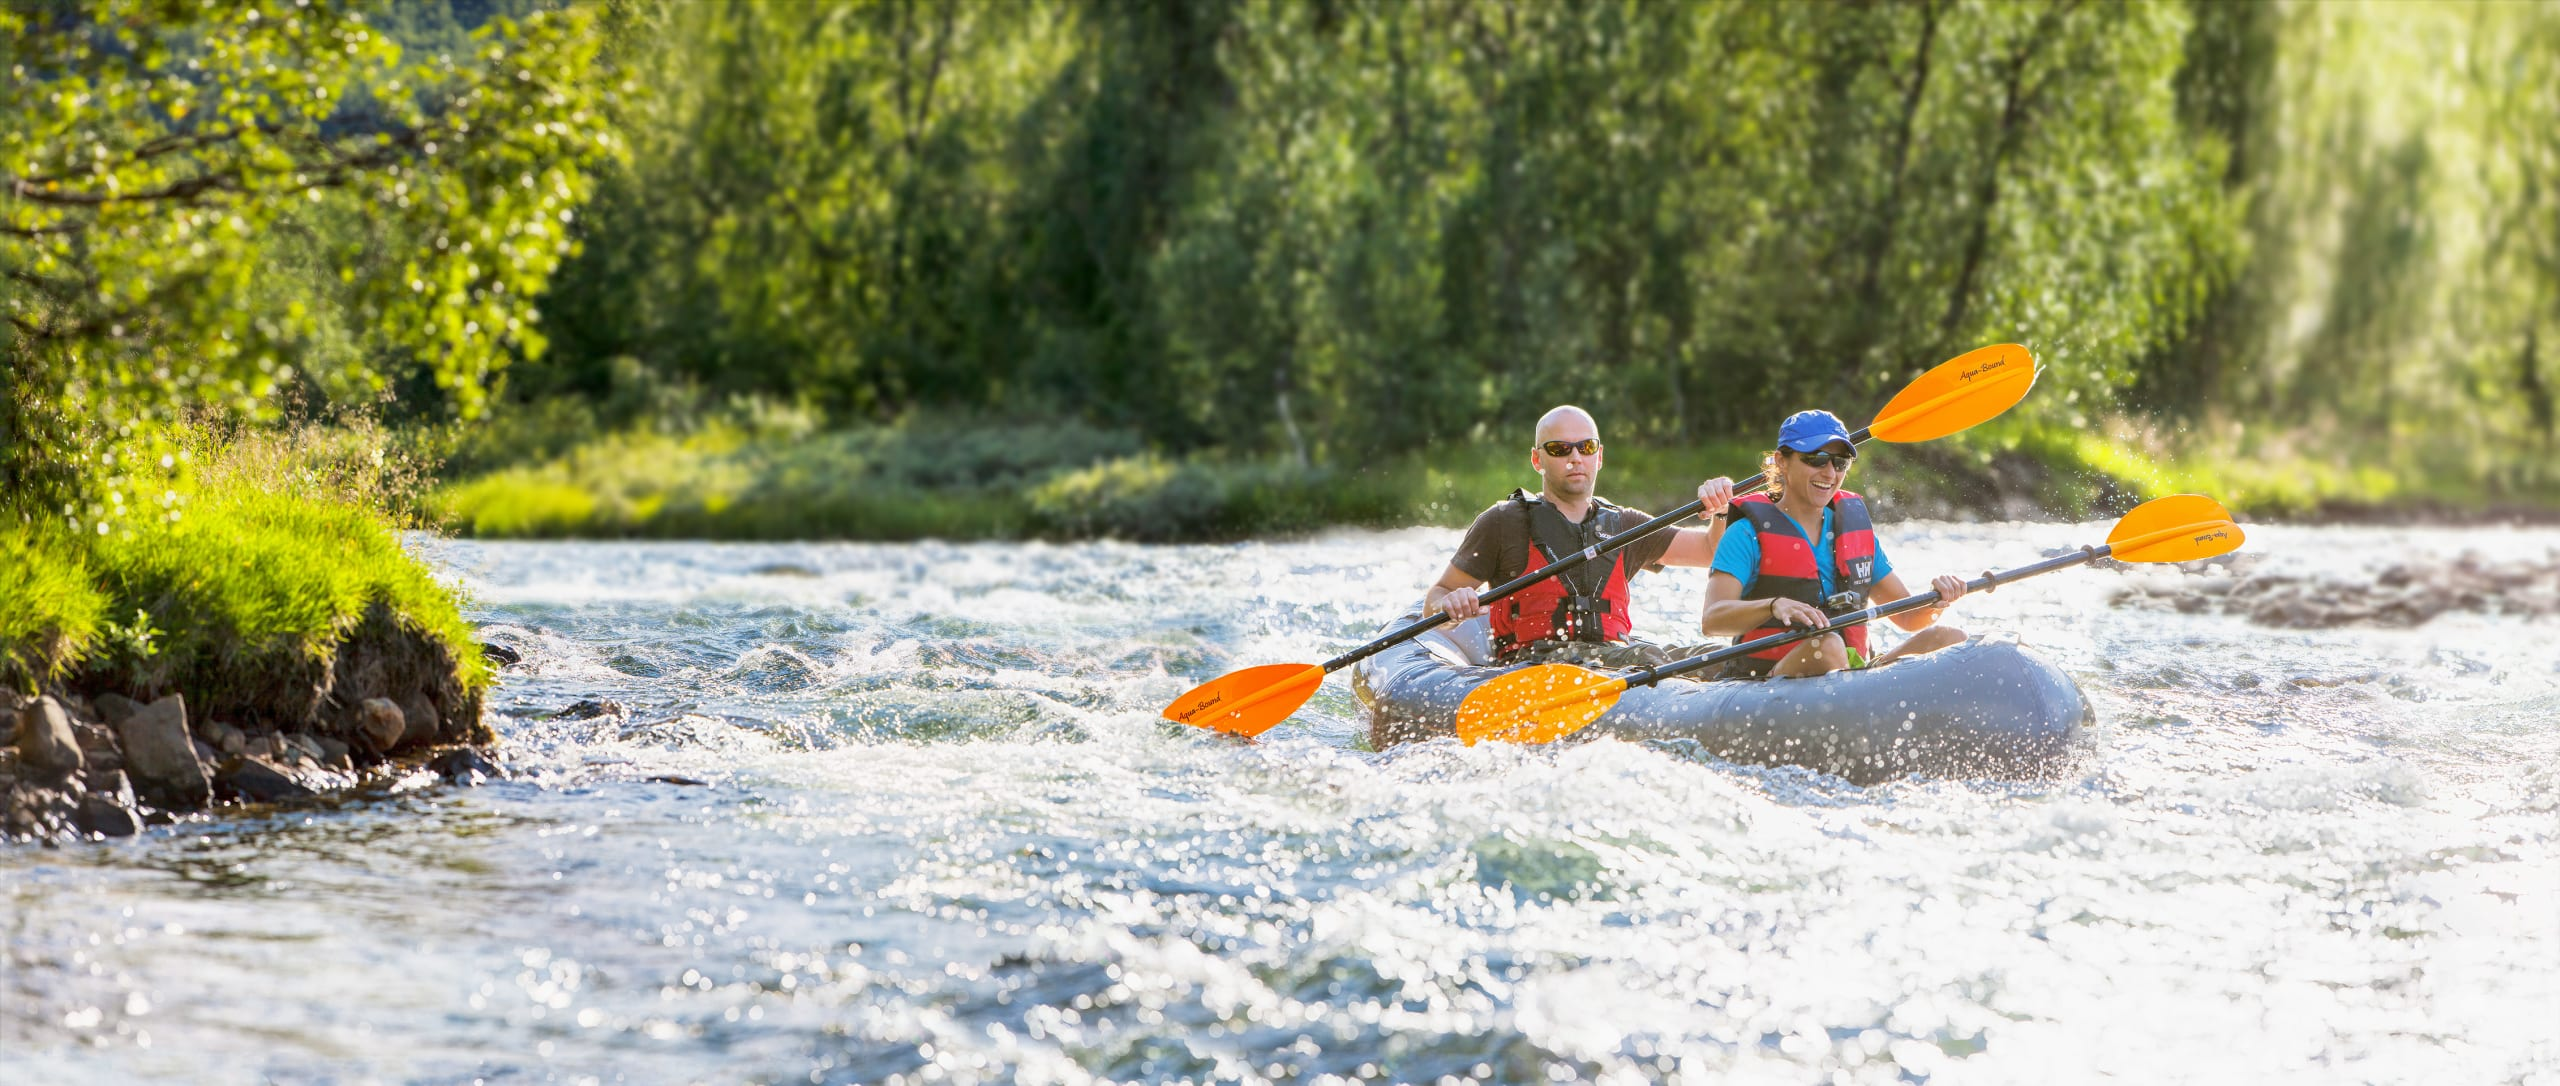 River rafting at Beitostølen and Jotunheimen